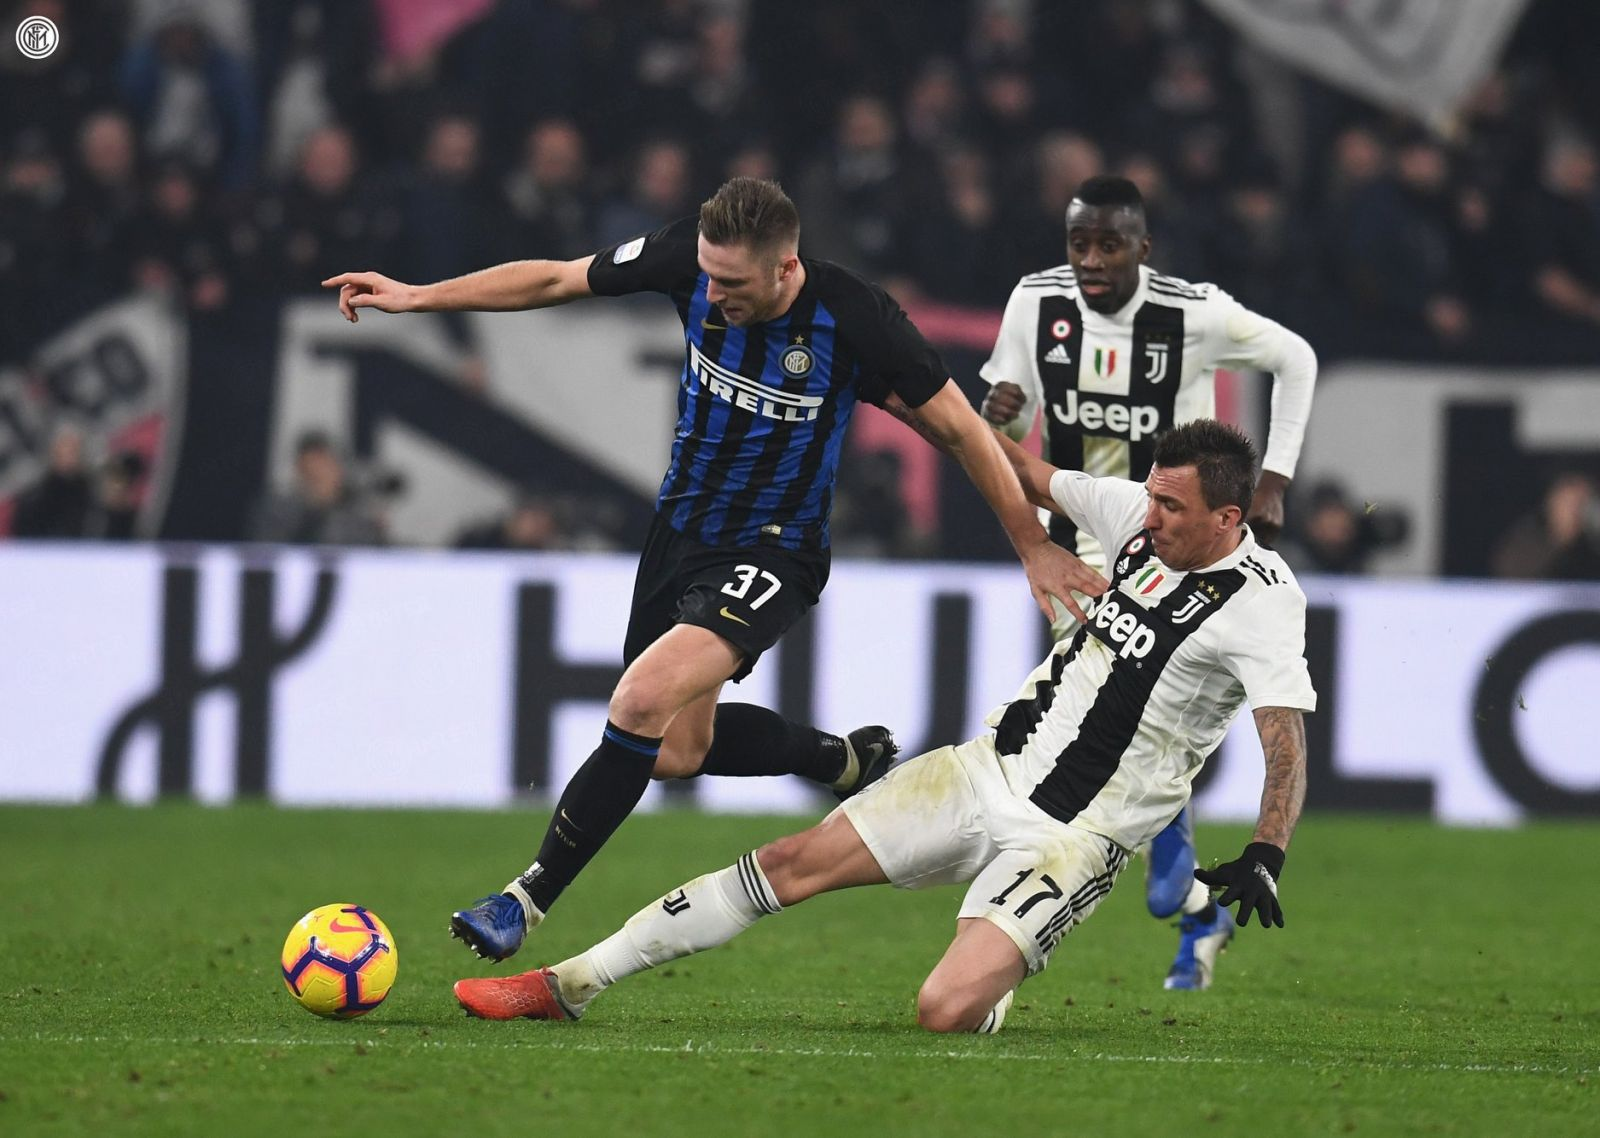 Juventus-Inter-Skriniar-Mandzukic